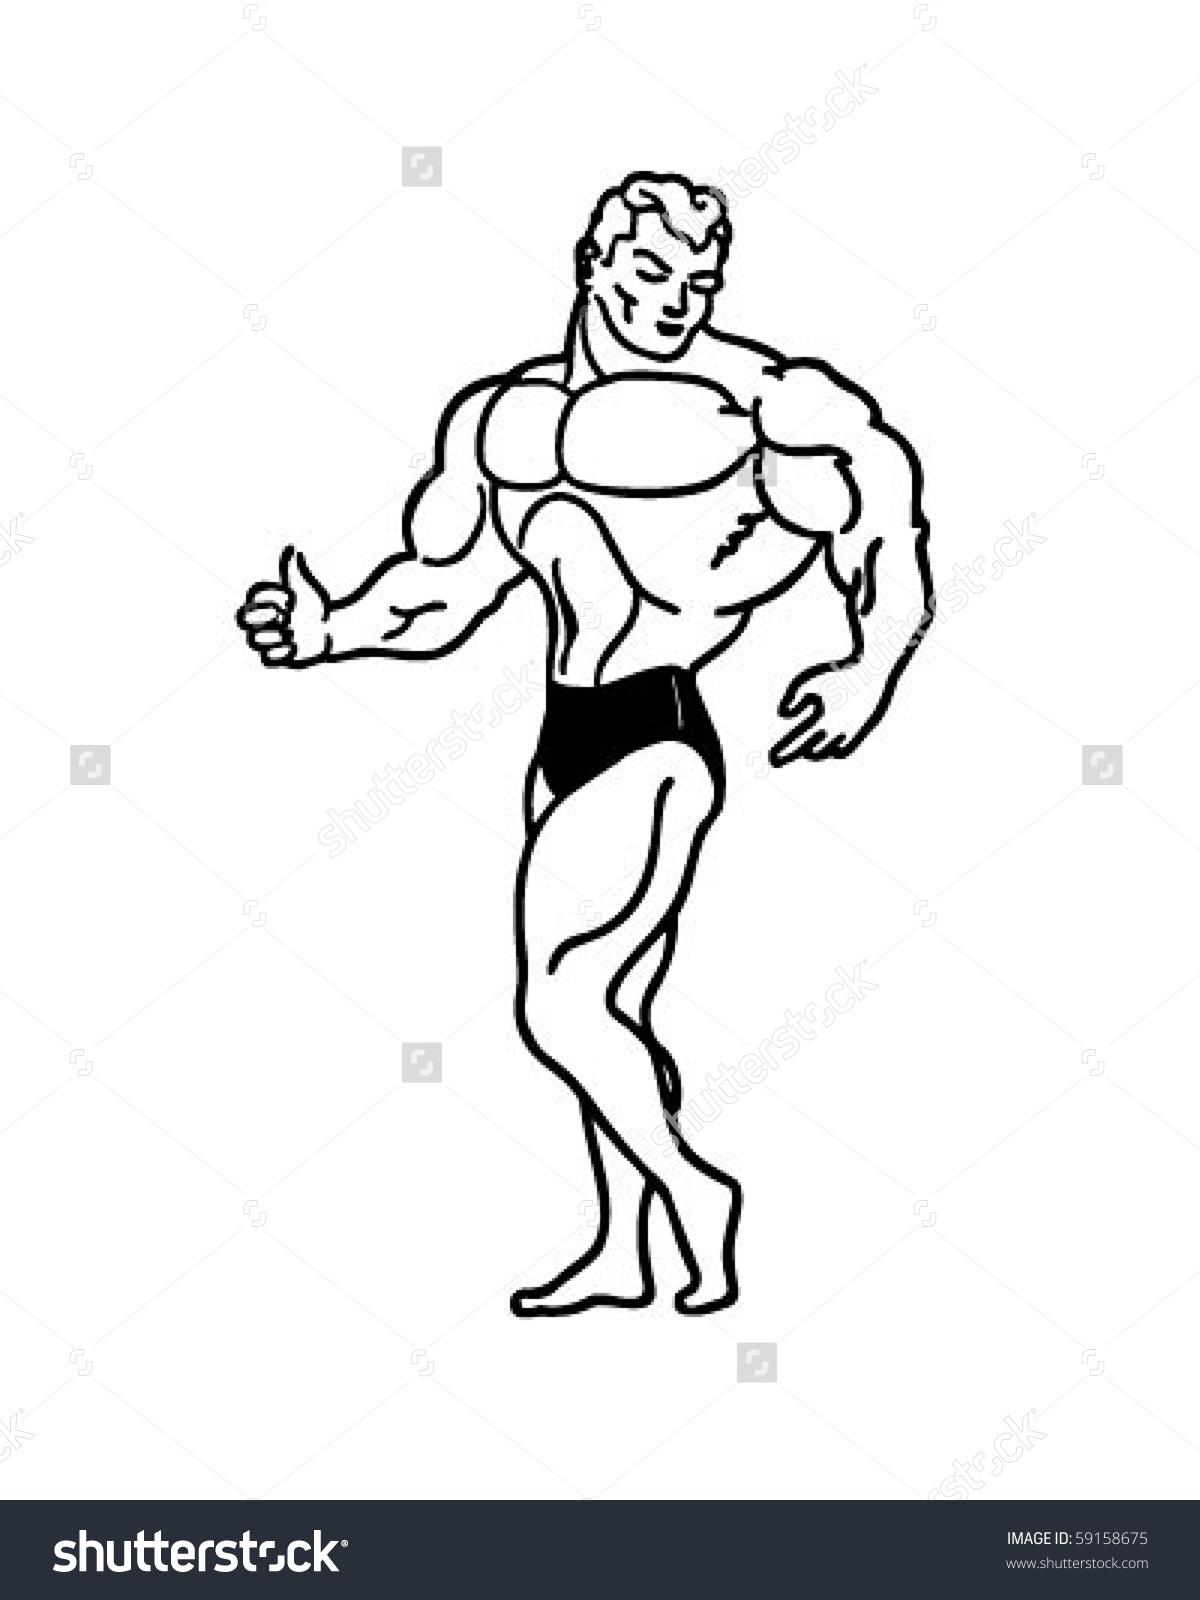 1200x1600 cartoon muscle man top of cartoon character of circus mighty